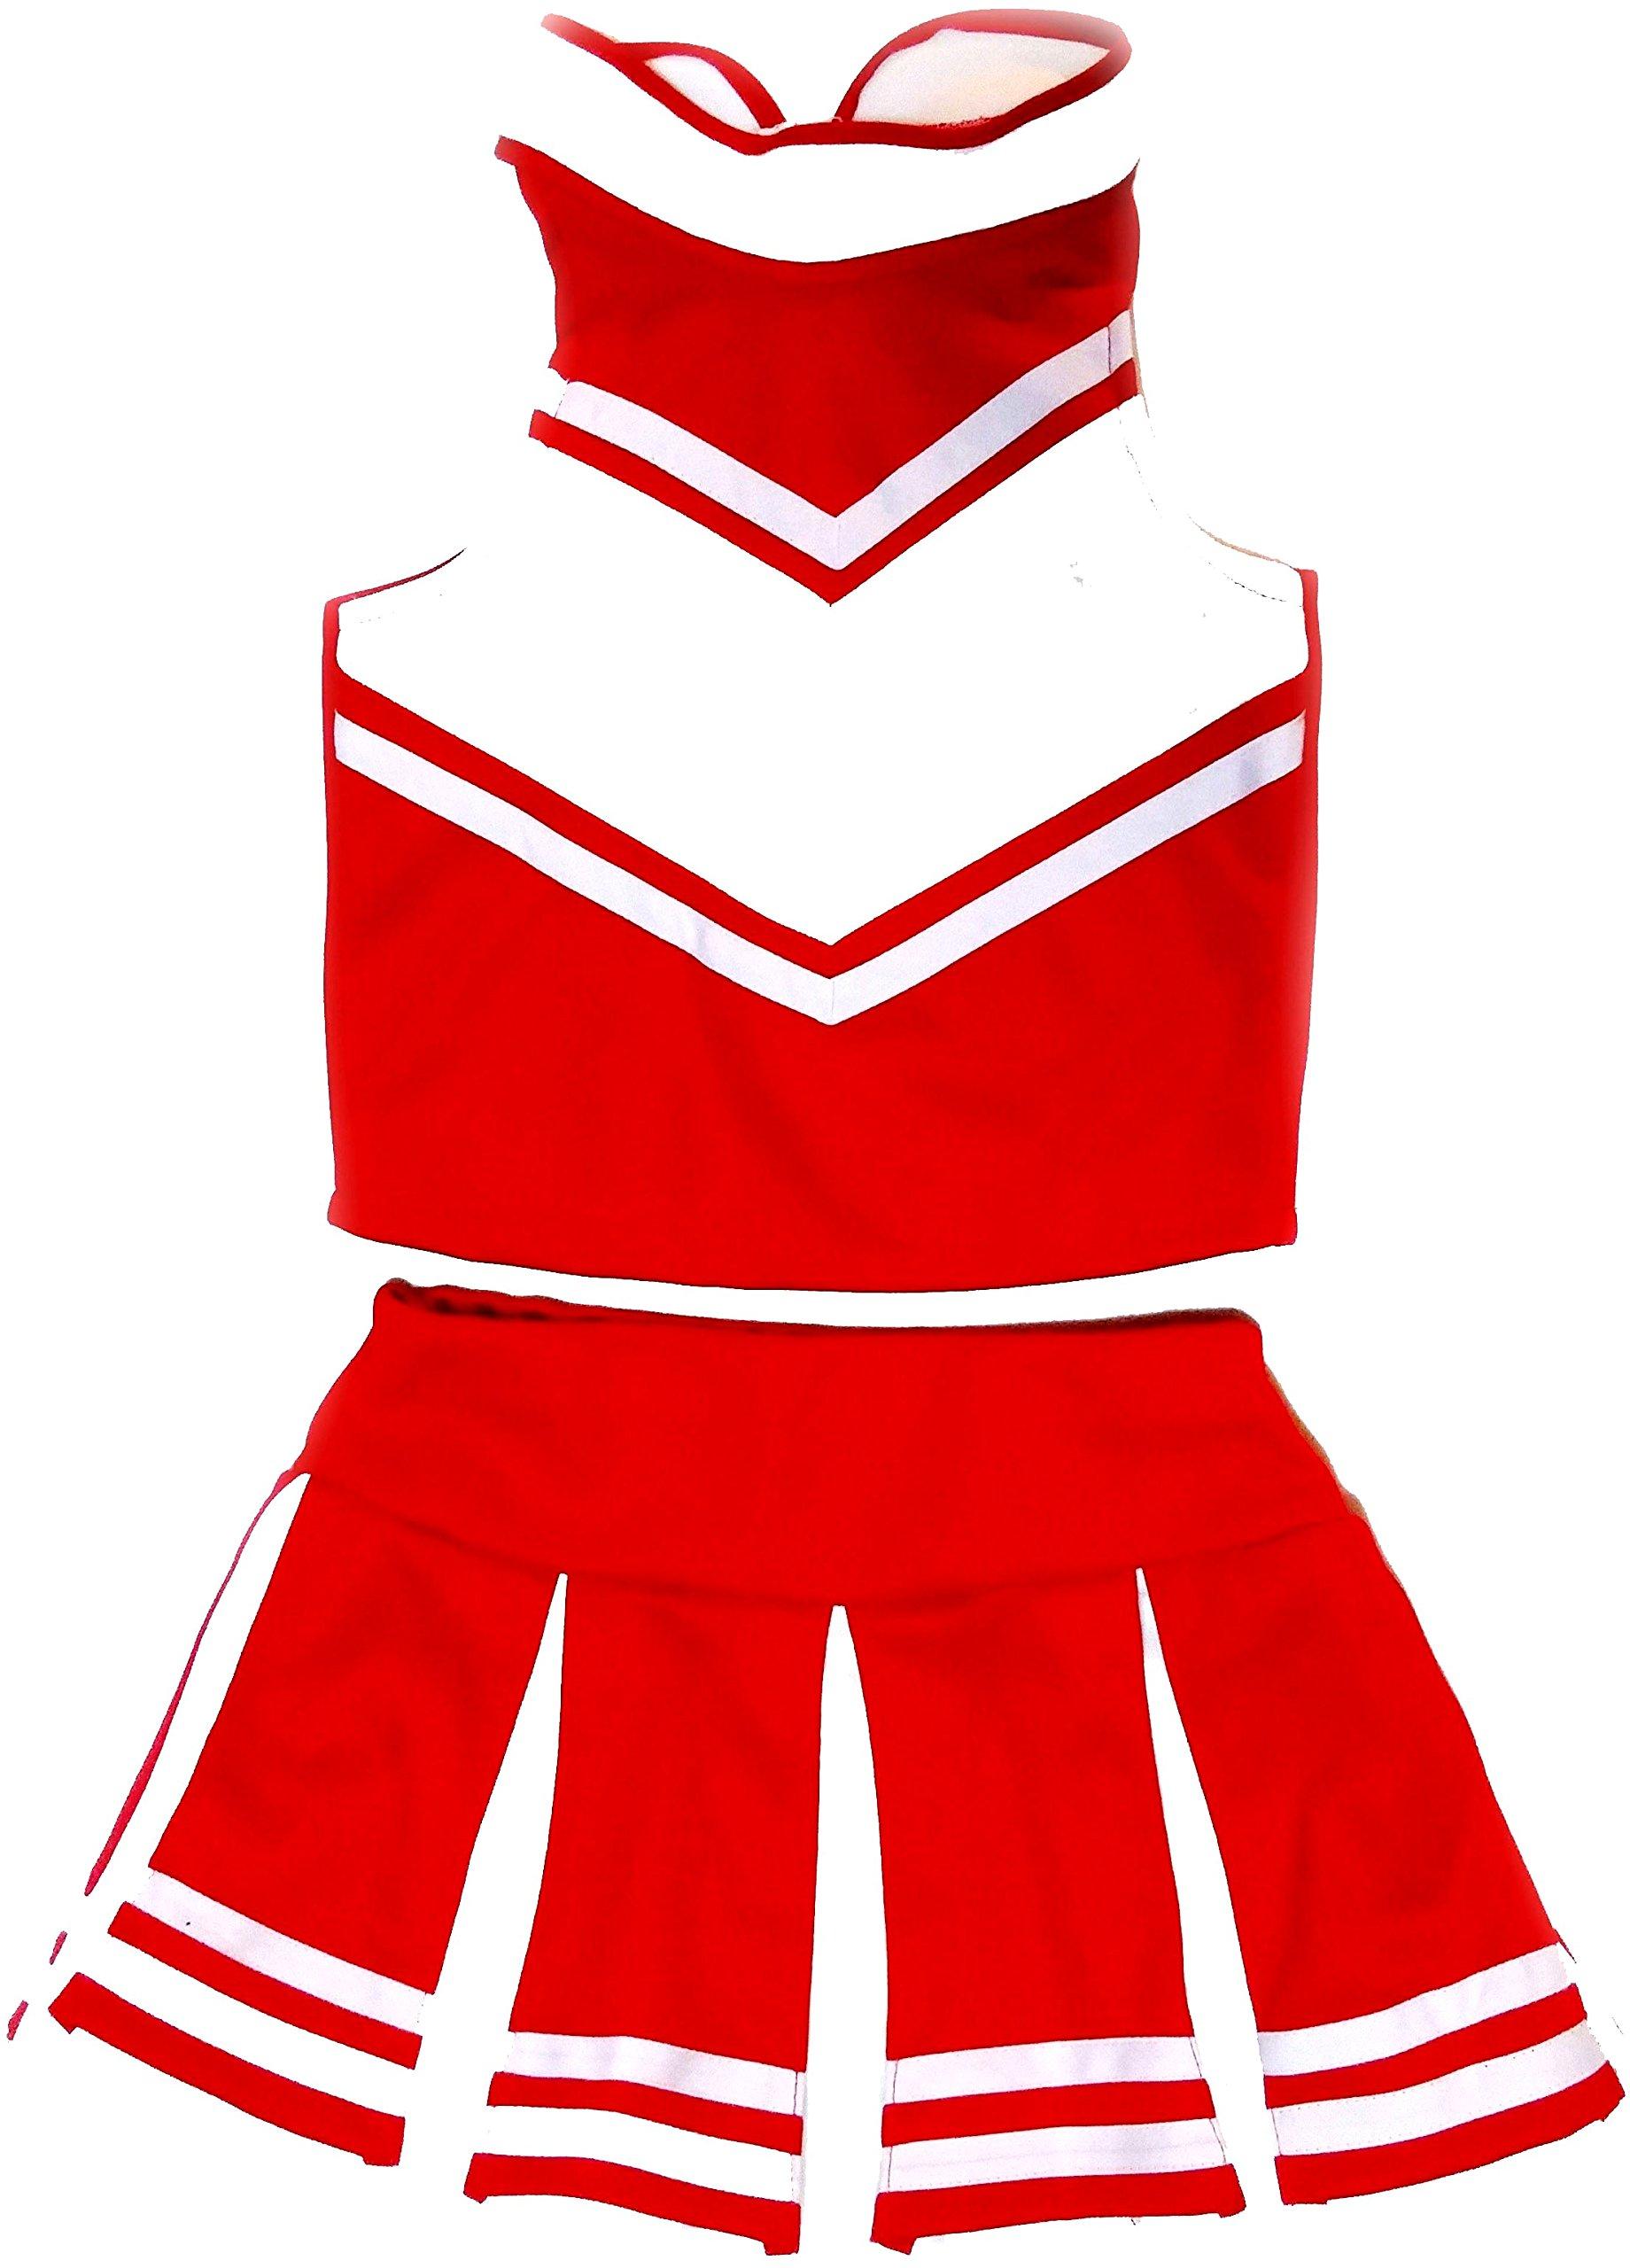 Women Cheerleader Cheerleading Outfit Uniform Costume Cosplay Red/White (XL/ 16-18)